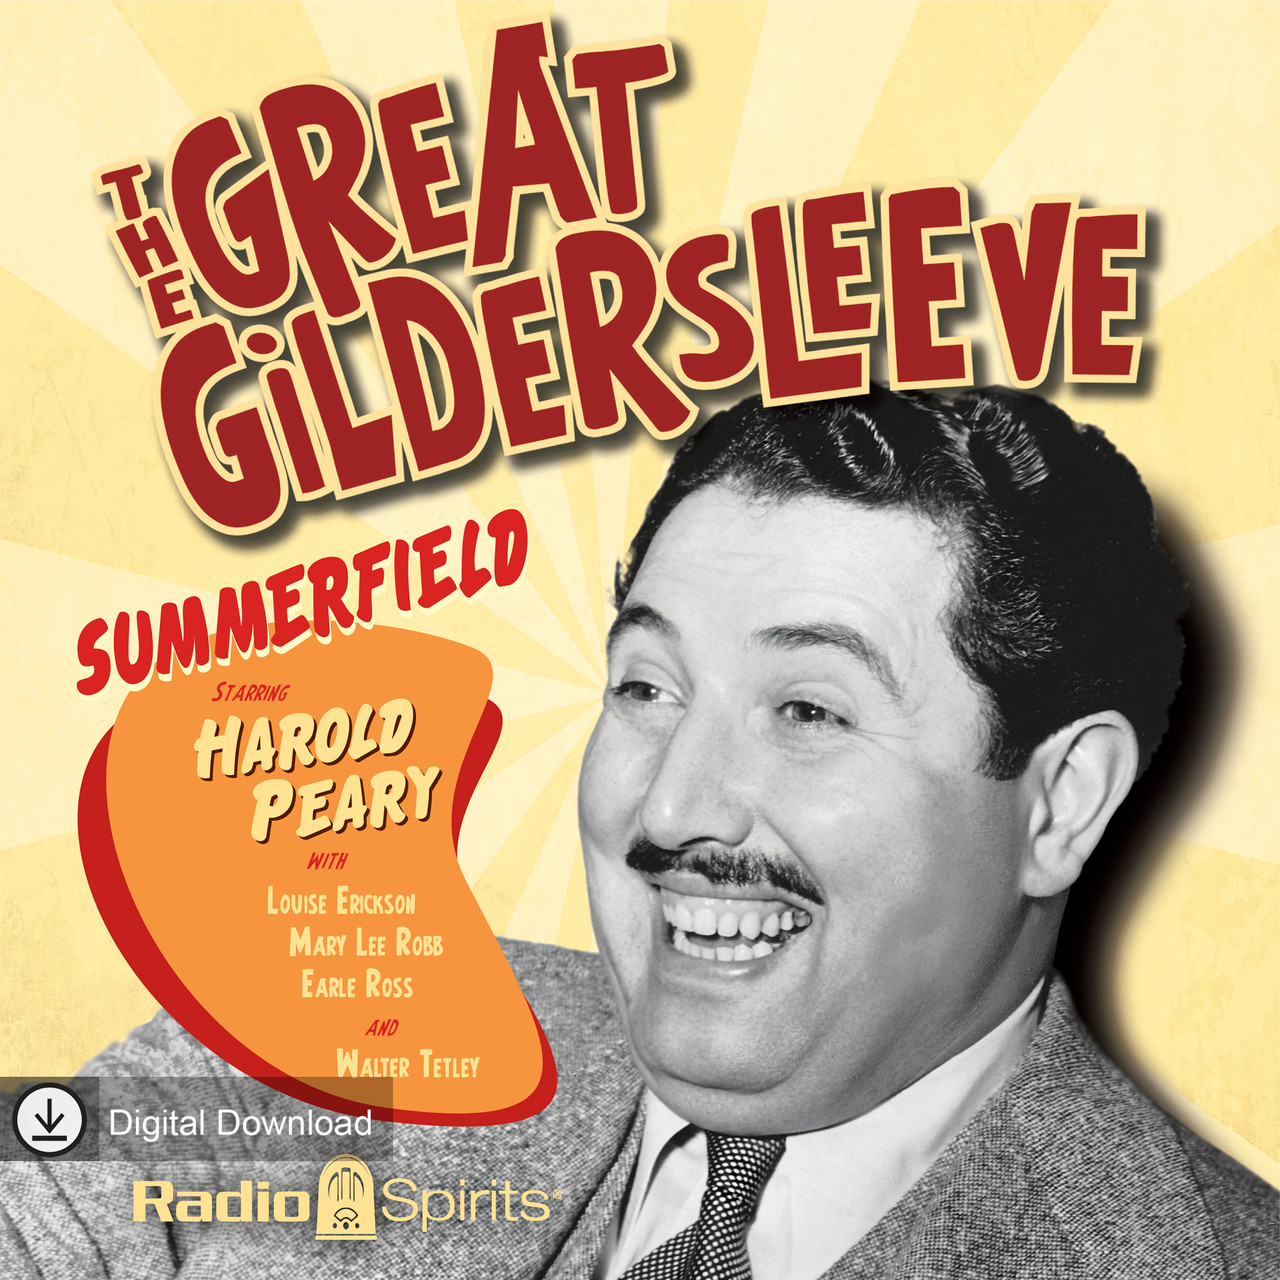 The Great Gildersleeve: Summerfield (MP3 Download)